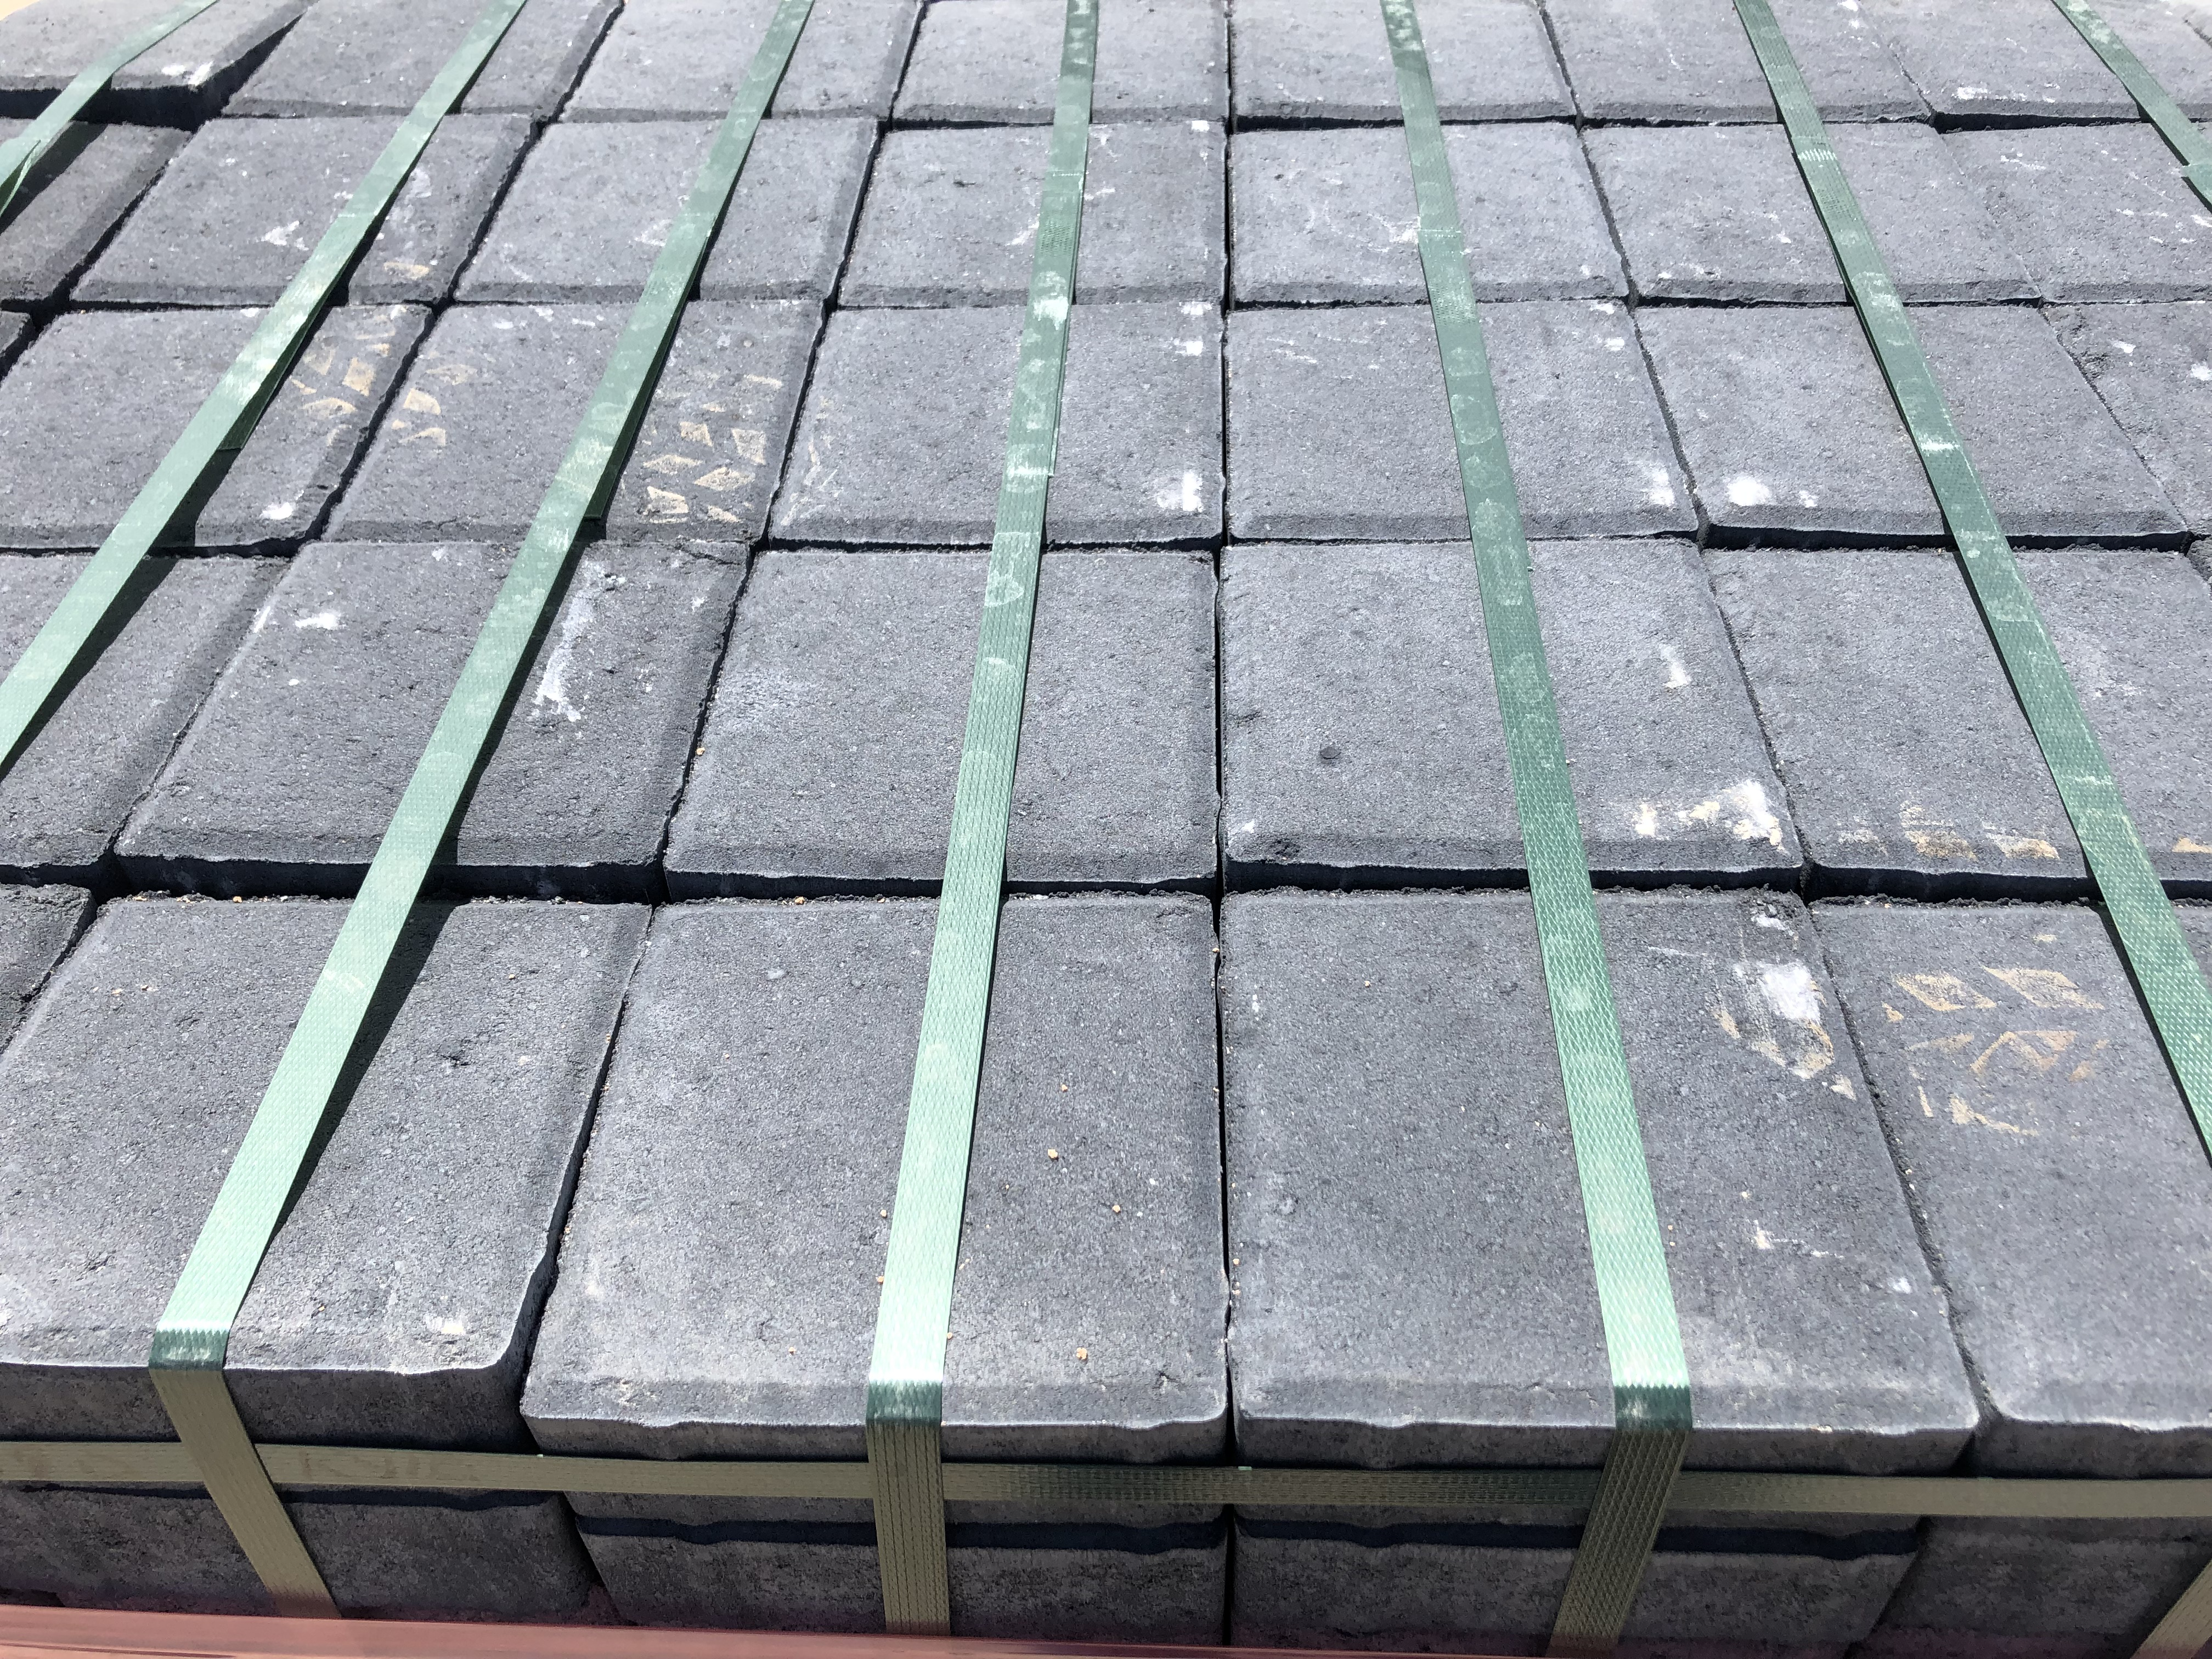 Jenkor Brick Sales - clay bricks, concrete bricks, paving, cement, building materials. Cape Town.